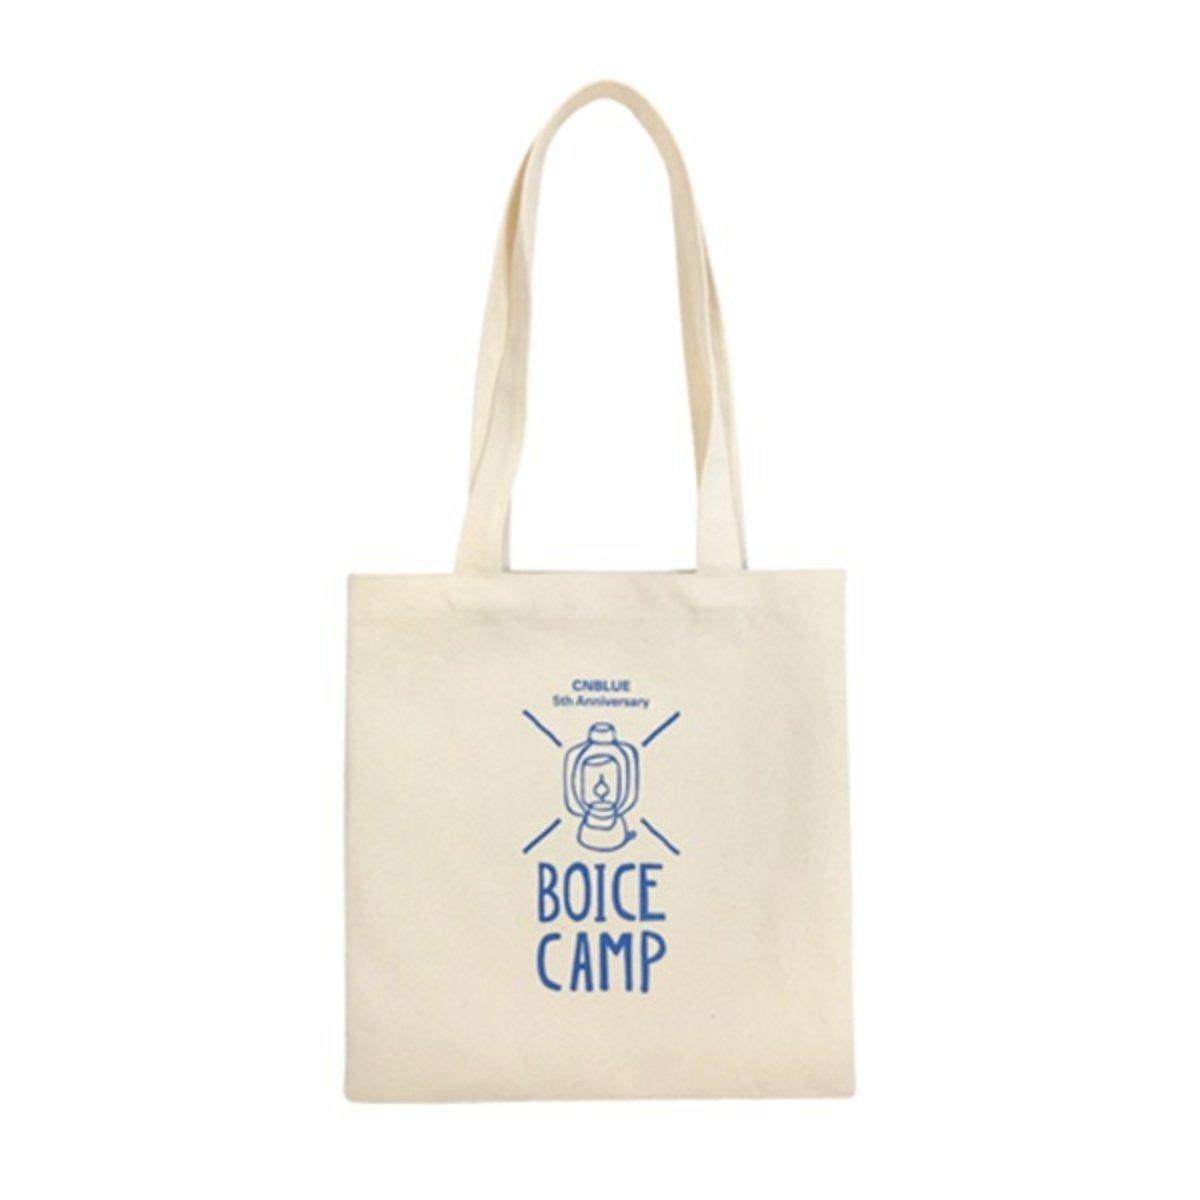 CNBLUE BOICE CAMP 環保袋_GD00016722